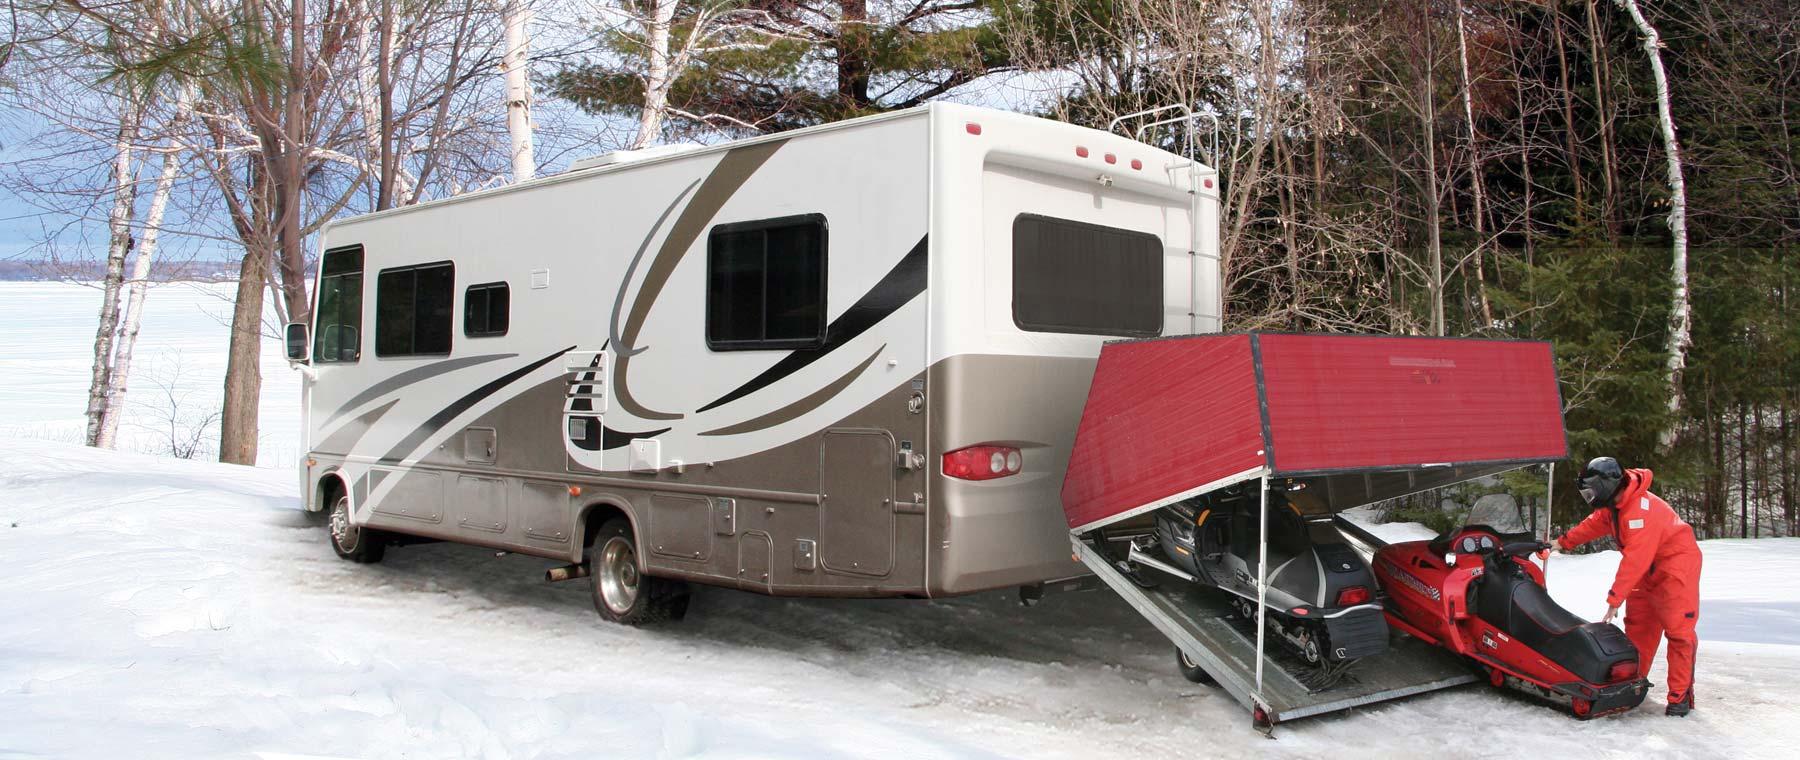 Winter RV Checklist - GoRVing Canada